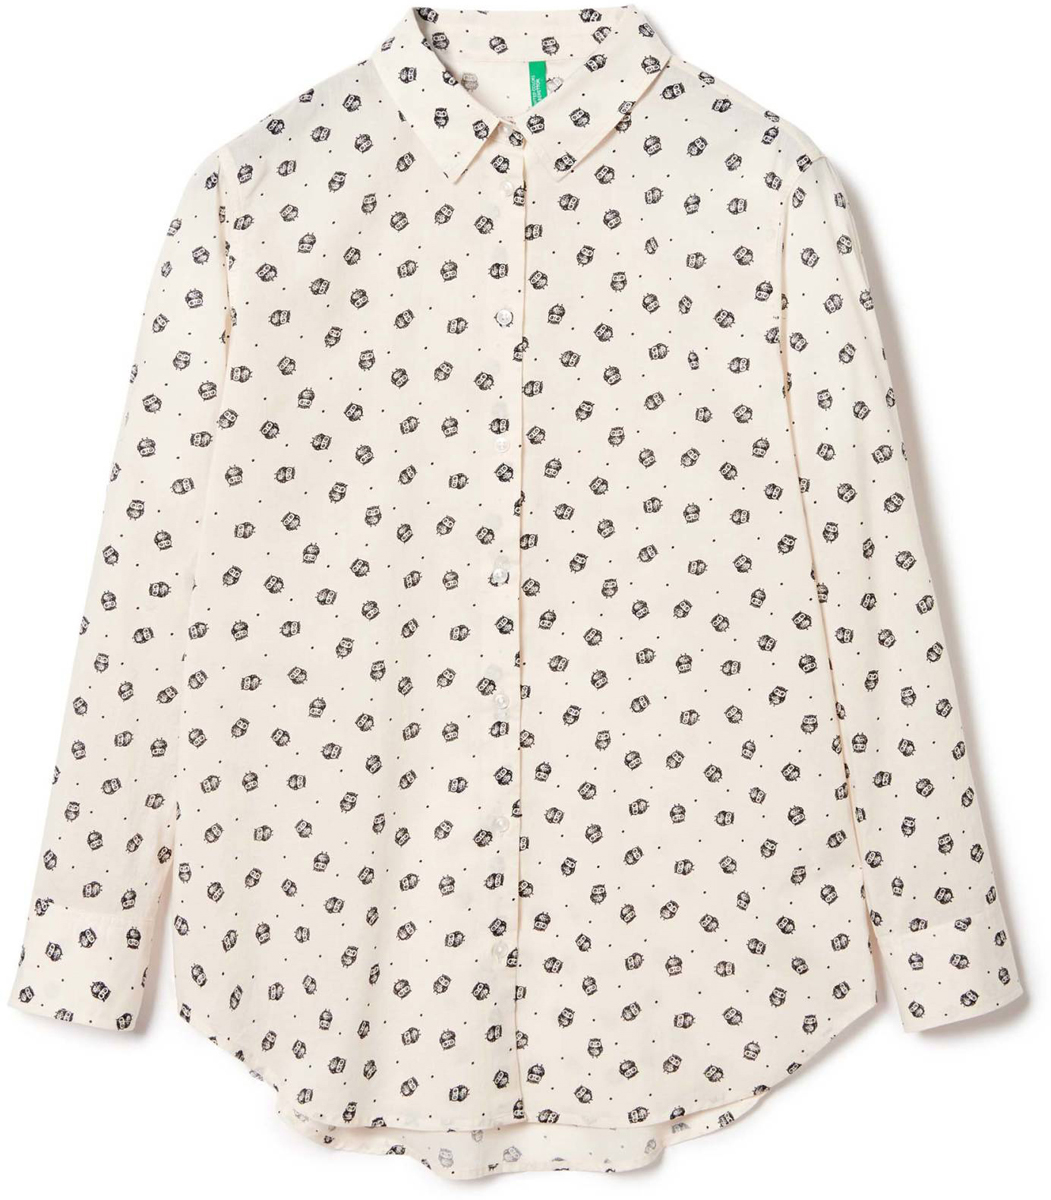 Рубашка жен United Colors of Benetton, цвет: белый, совы. 5DFX5Q715_911. Размер S (42/44)5DFX5Q715_911